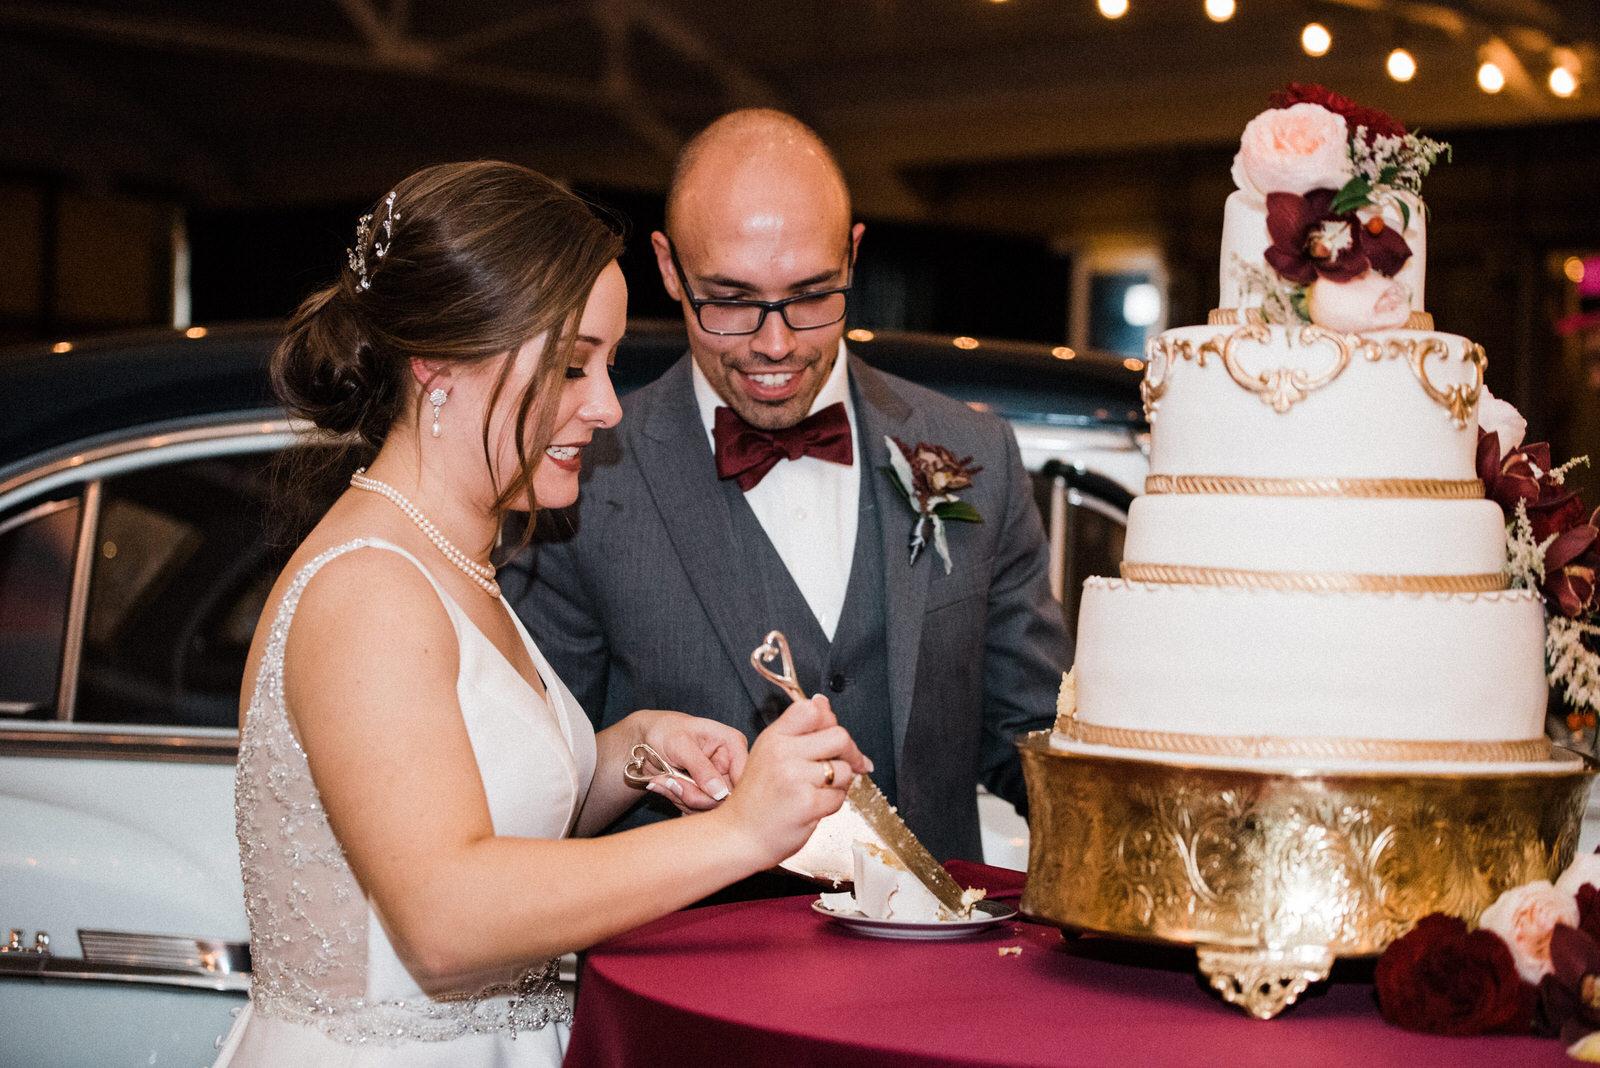 Cake cutting.Americas Packard Museum wedding